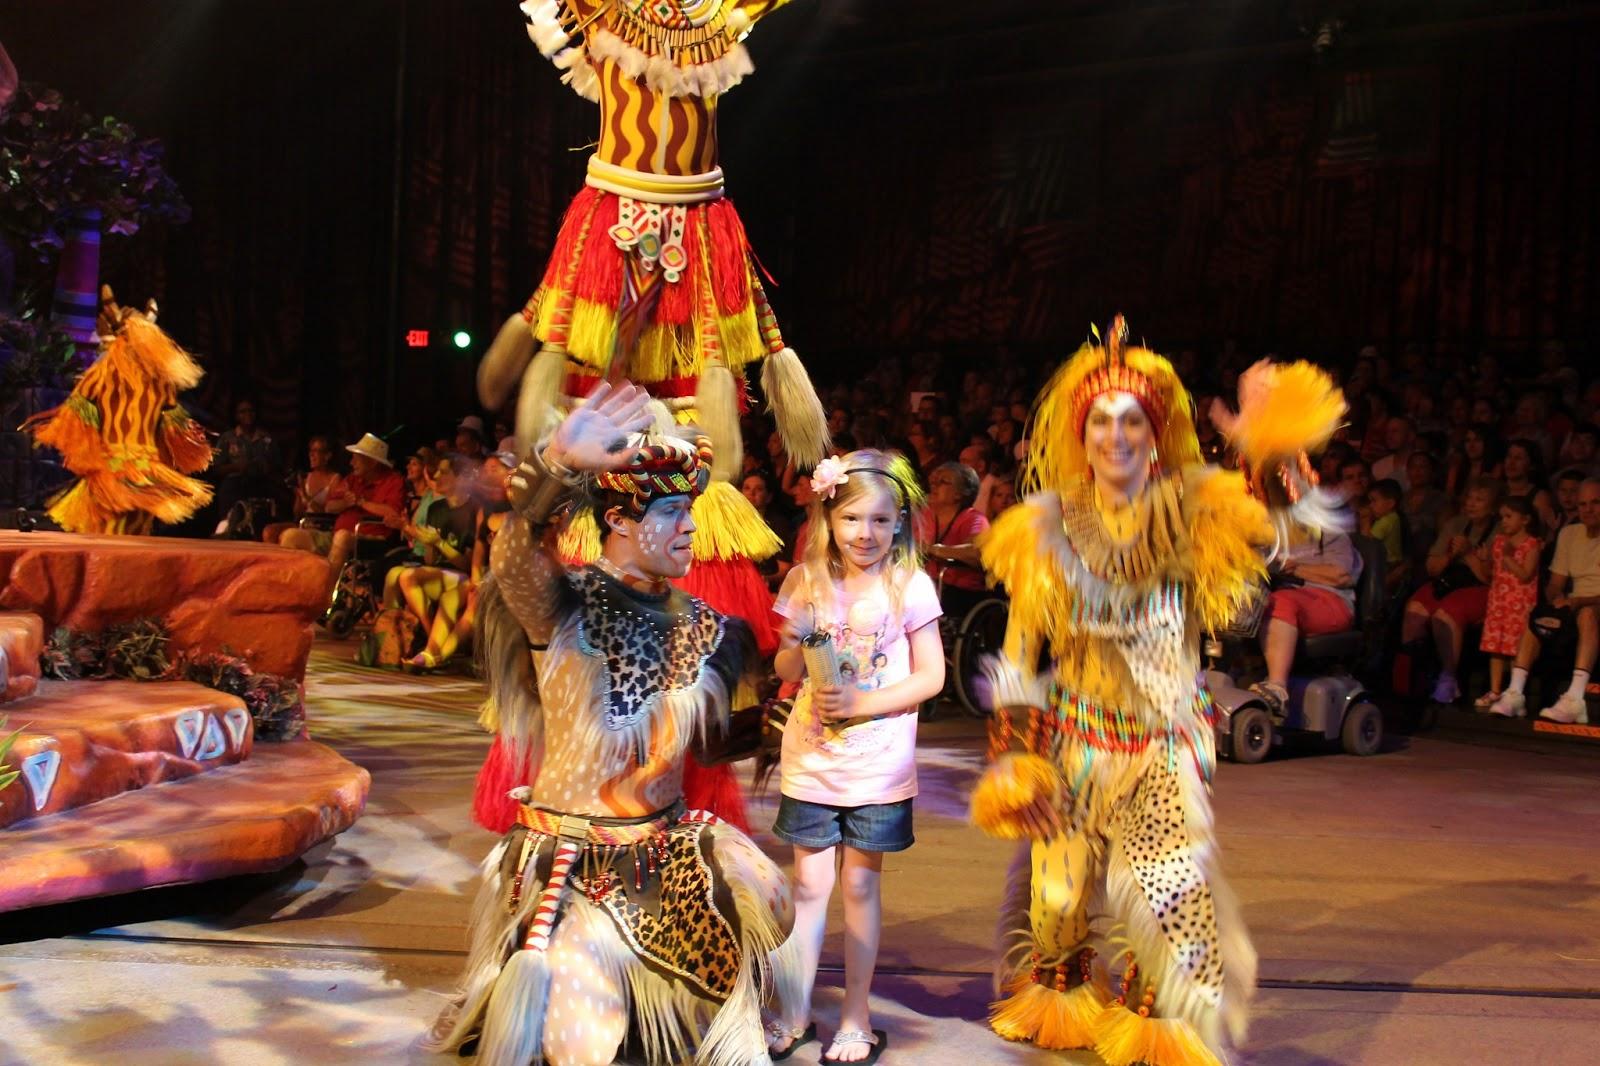 janelle u0026 39 s wish  festival of the lion king